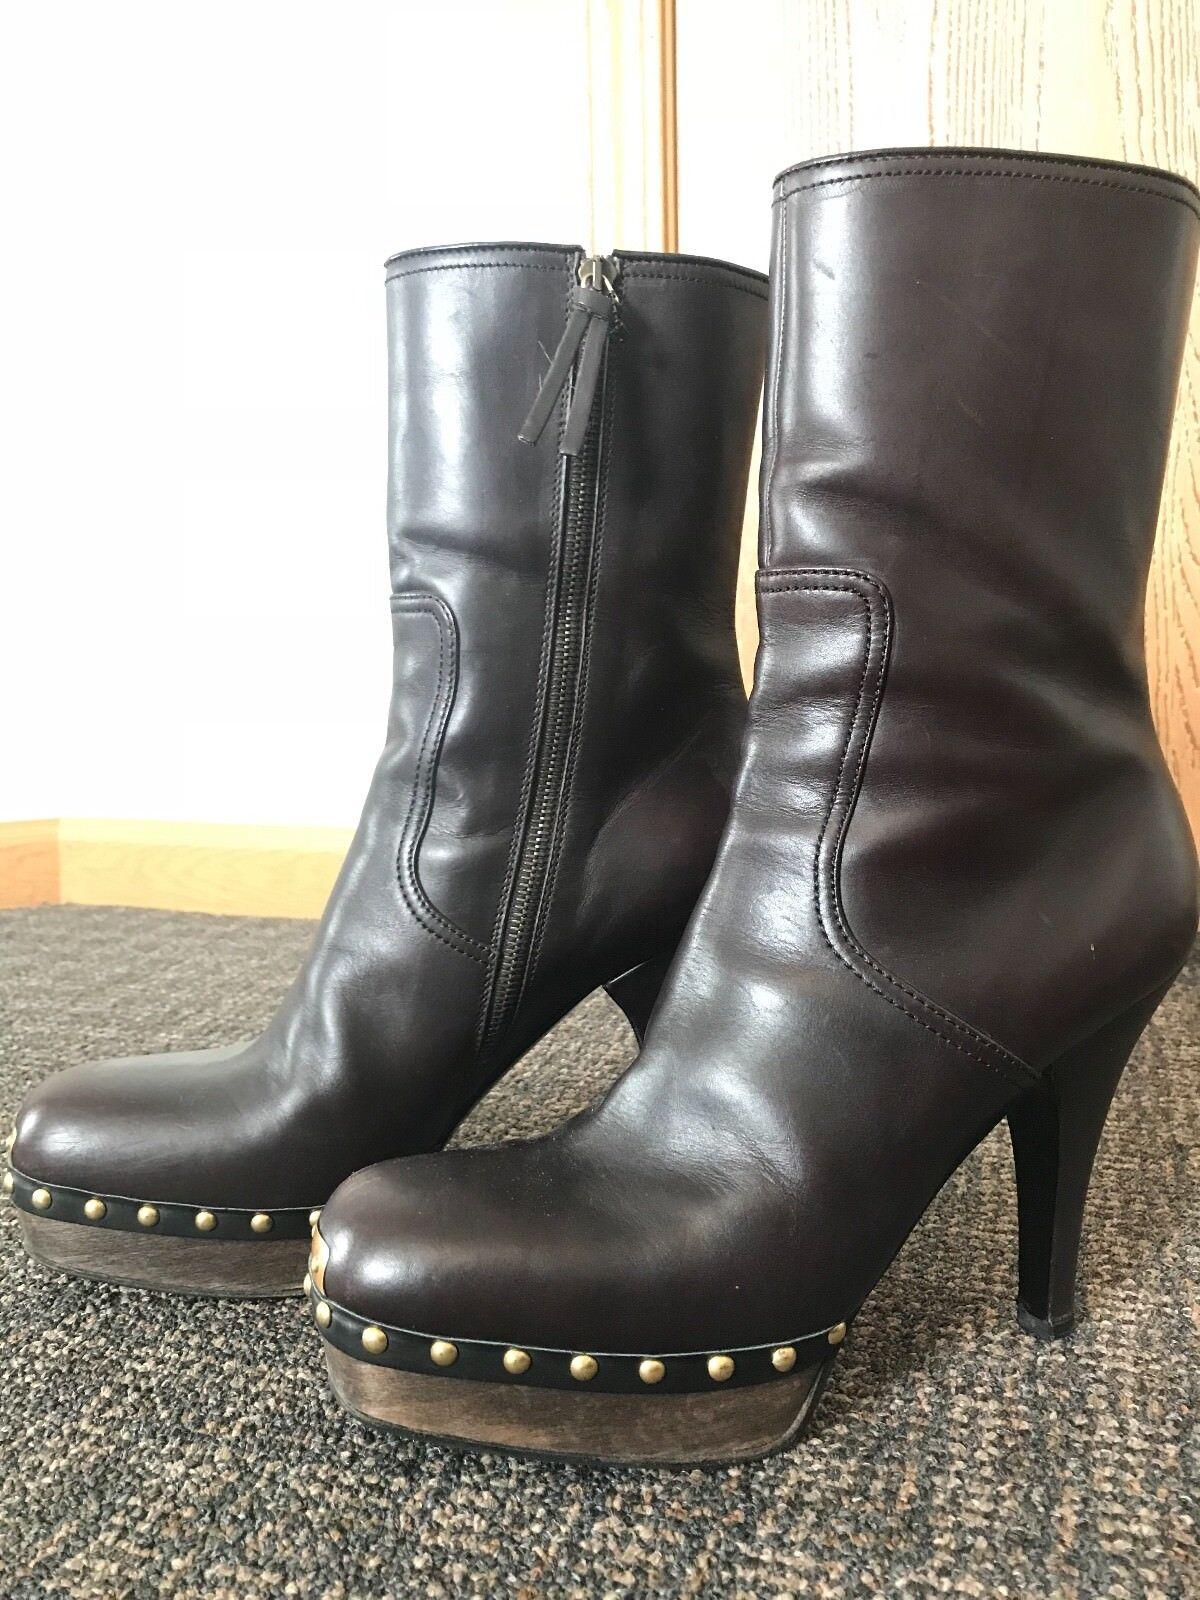 MIU MIU Old Calf Wood Leather Studded Boots Brown Womens Womens Womens Size EU 40   US 9.5 8f41a3